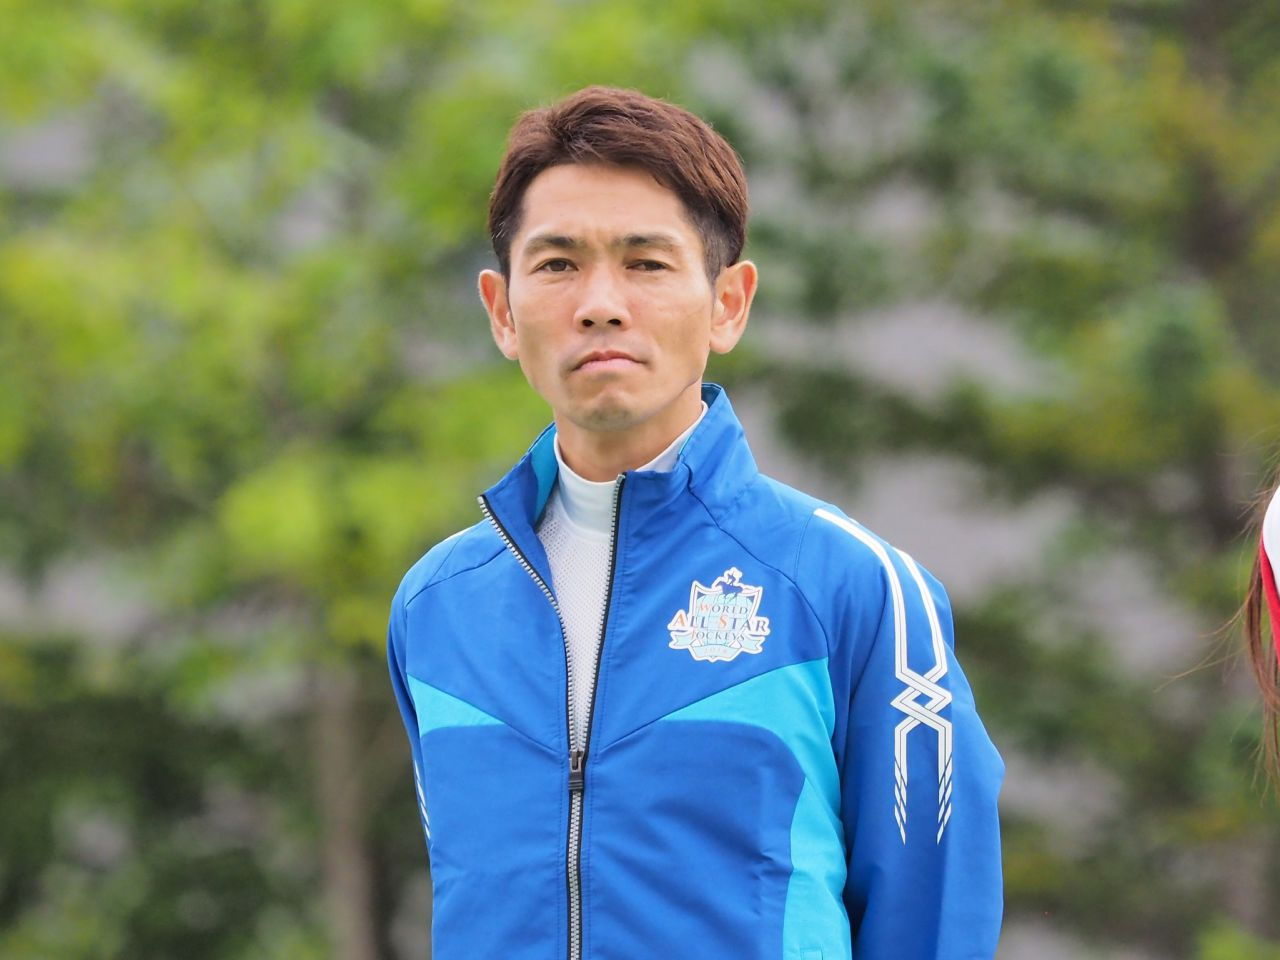 【WASJ第2戦】K.ティータンが抜け出す!行った行ったの競馬で2着に戸崎圭太が粘る